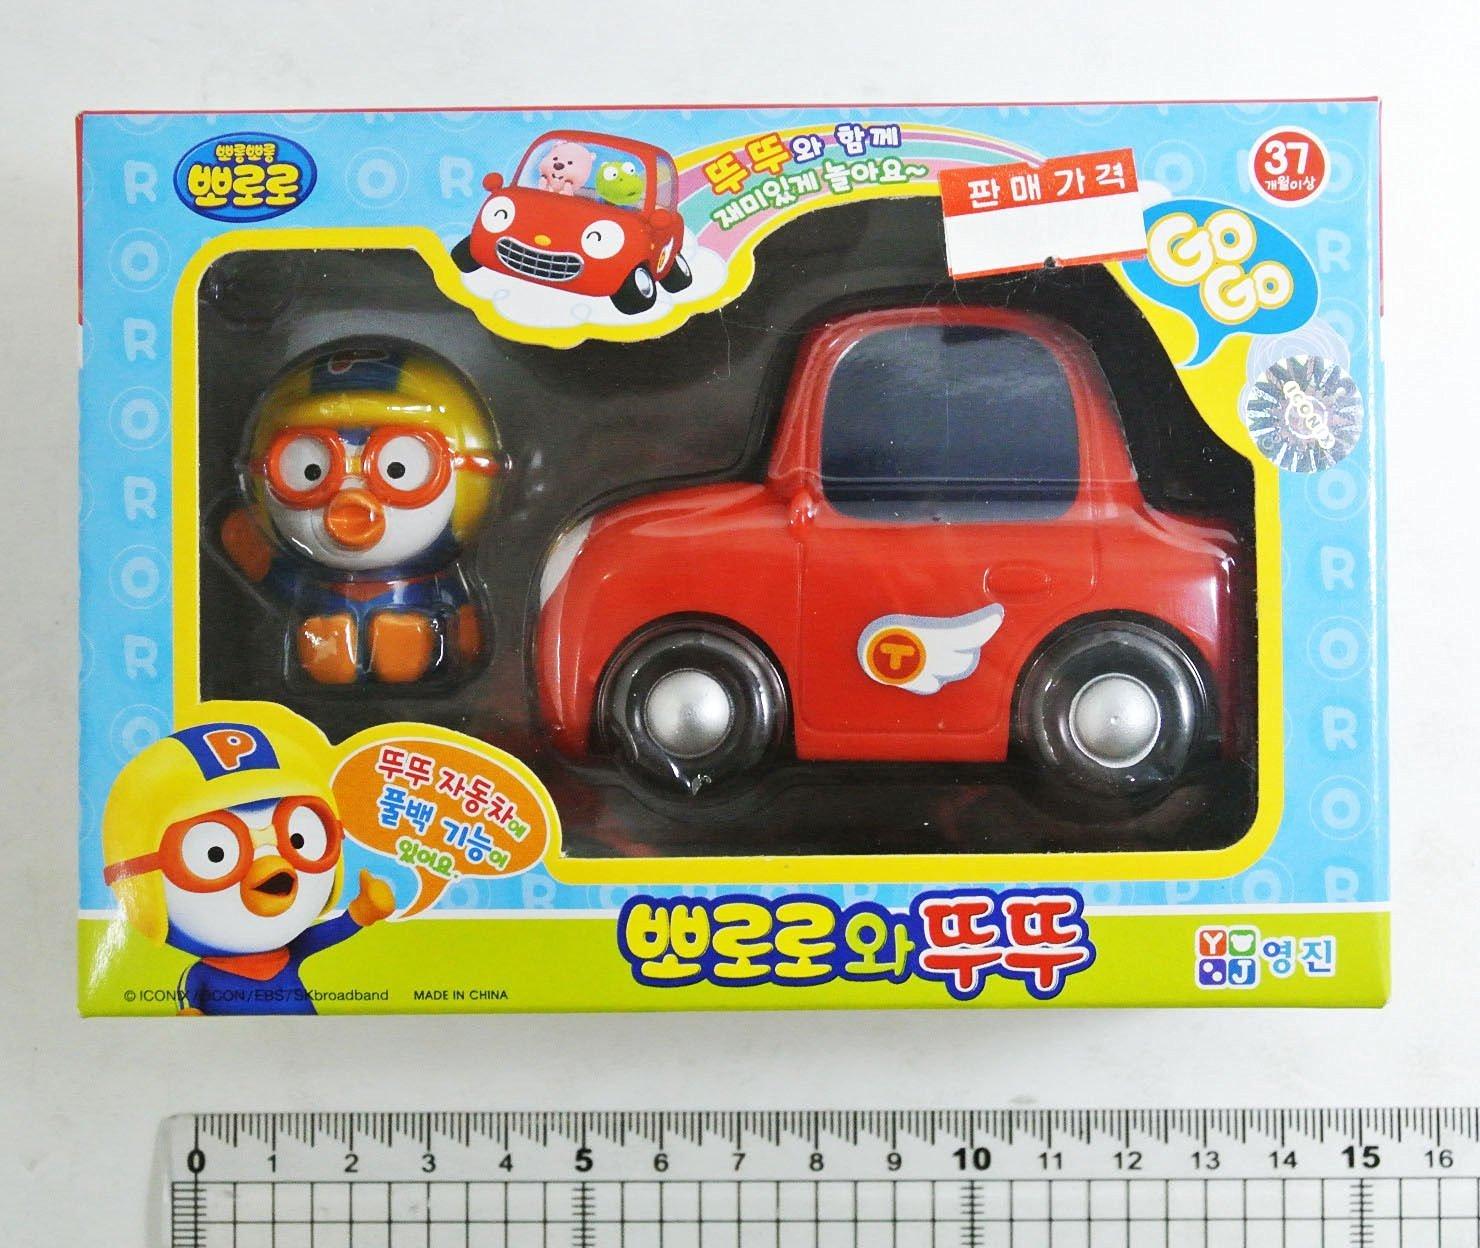 Children Kids Gift Toy Pororo Mini Car Play Set Full Back Gear Korean Animation /item# G4W8B-48Q30784